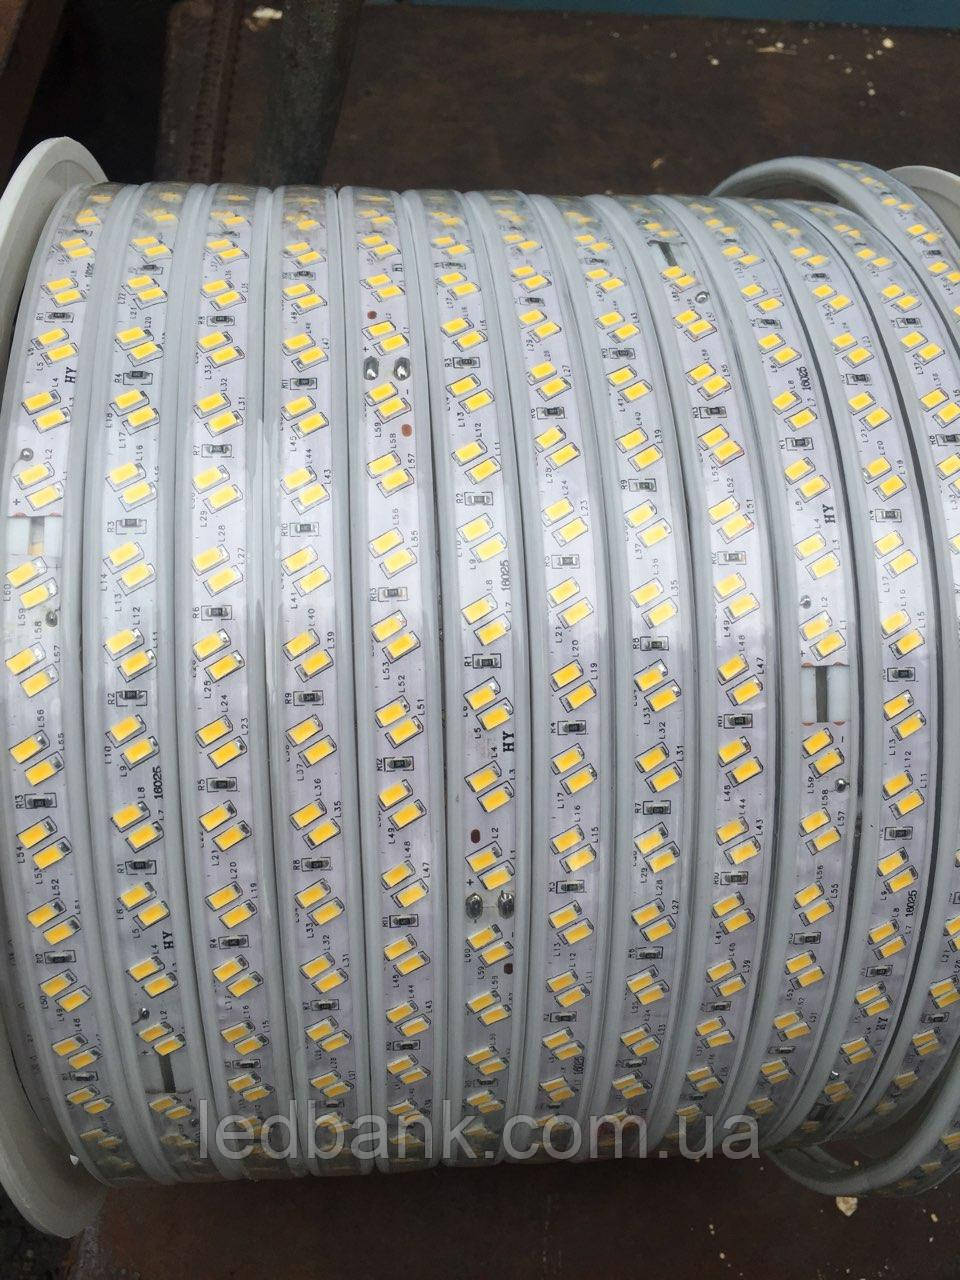 Светодиодная лента 220В SMD5730 120LED IP68 White СУПЕР ЯРКАЯ !!!